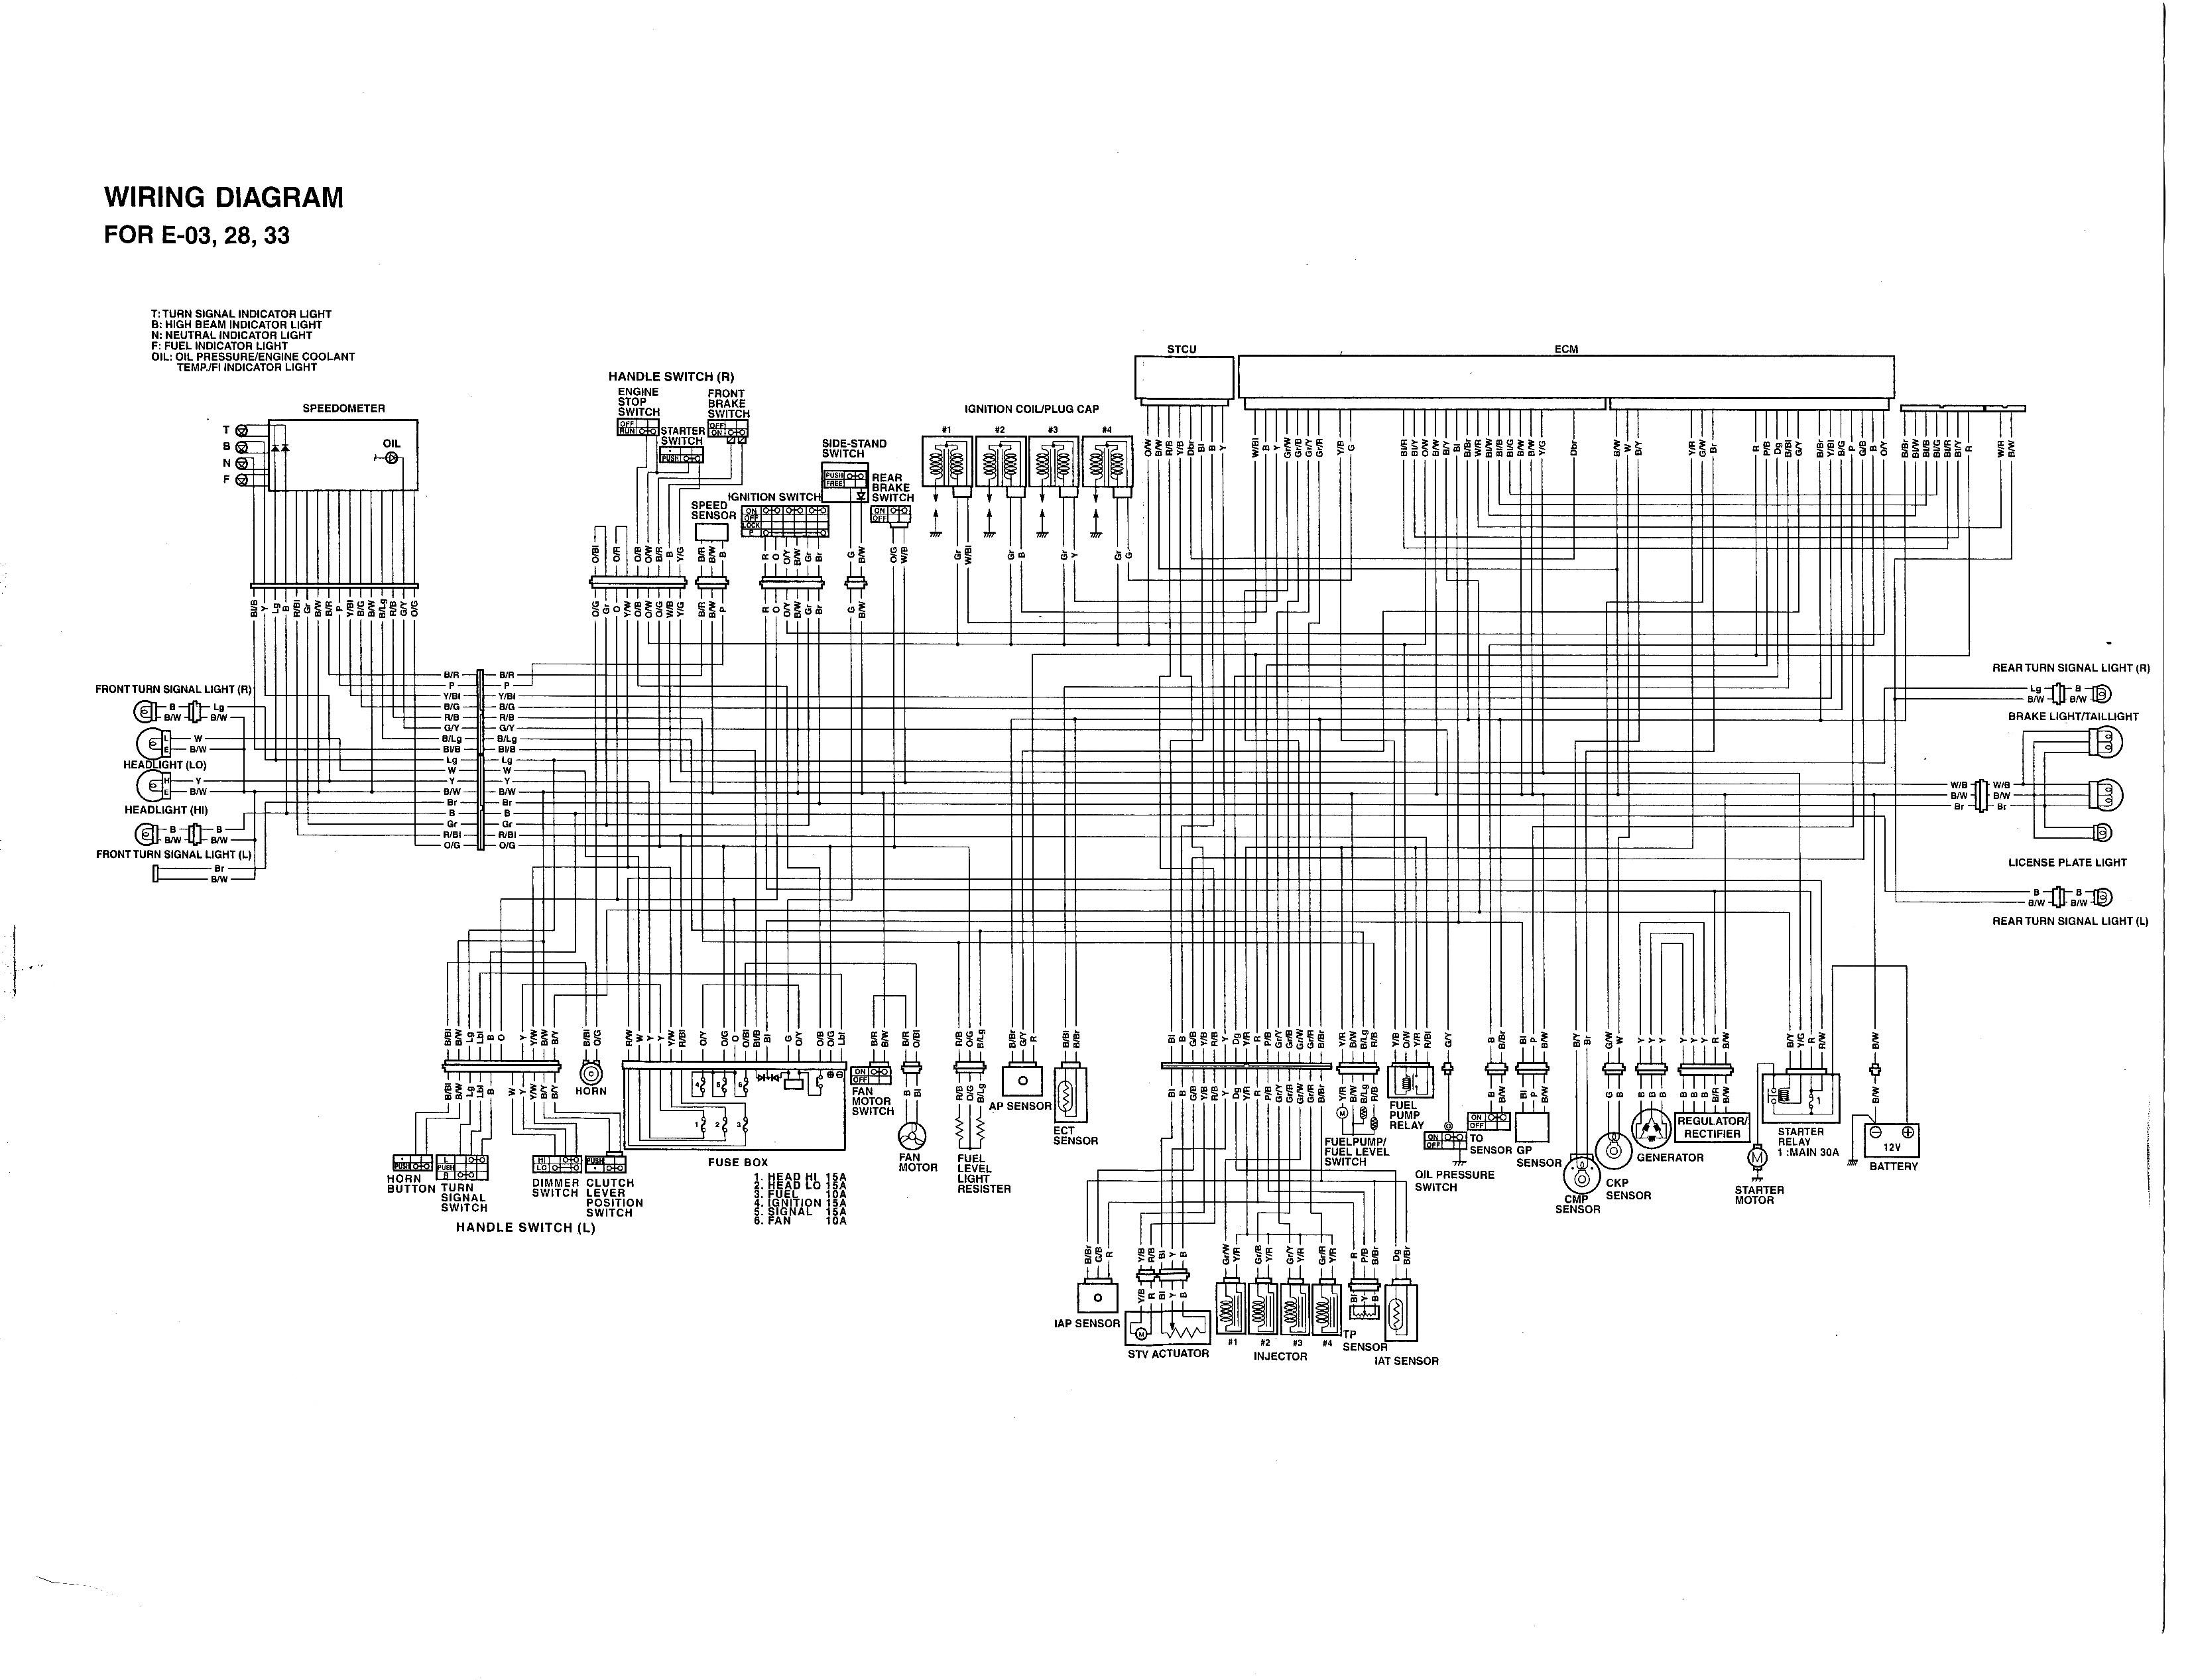 EV_7728] 1994 Suzuki Gsxr 750 Wiring Diagram Download DiagramMill Odga Tran Sple Nedly Rdona Heeve Mohammedshrine Librar Wiring 101